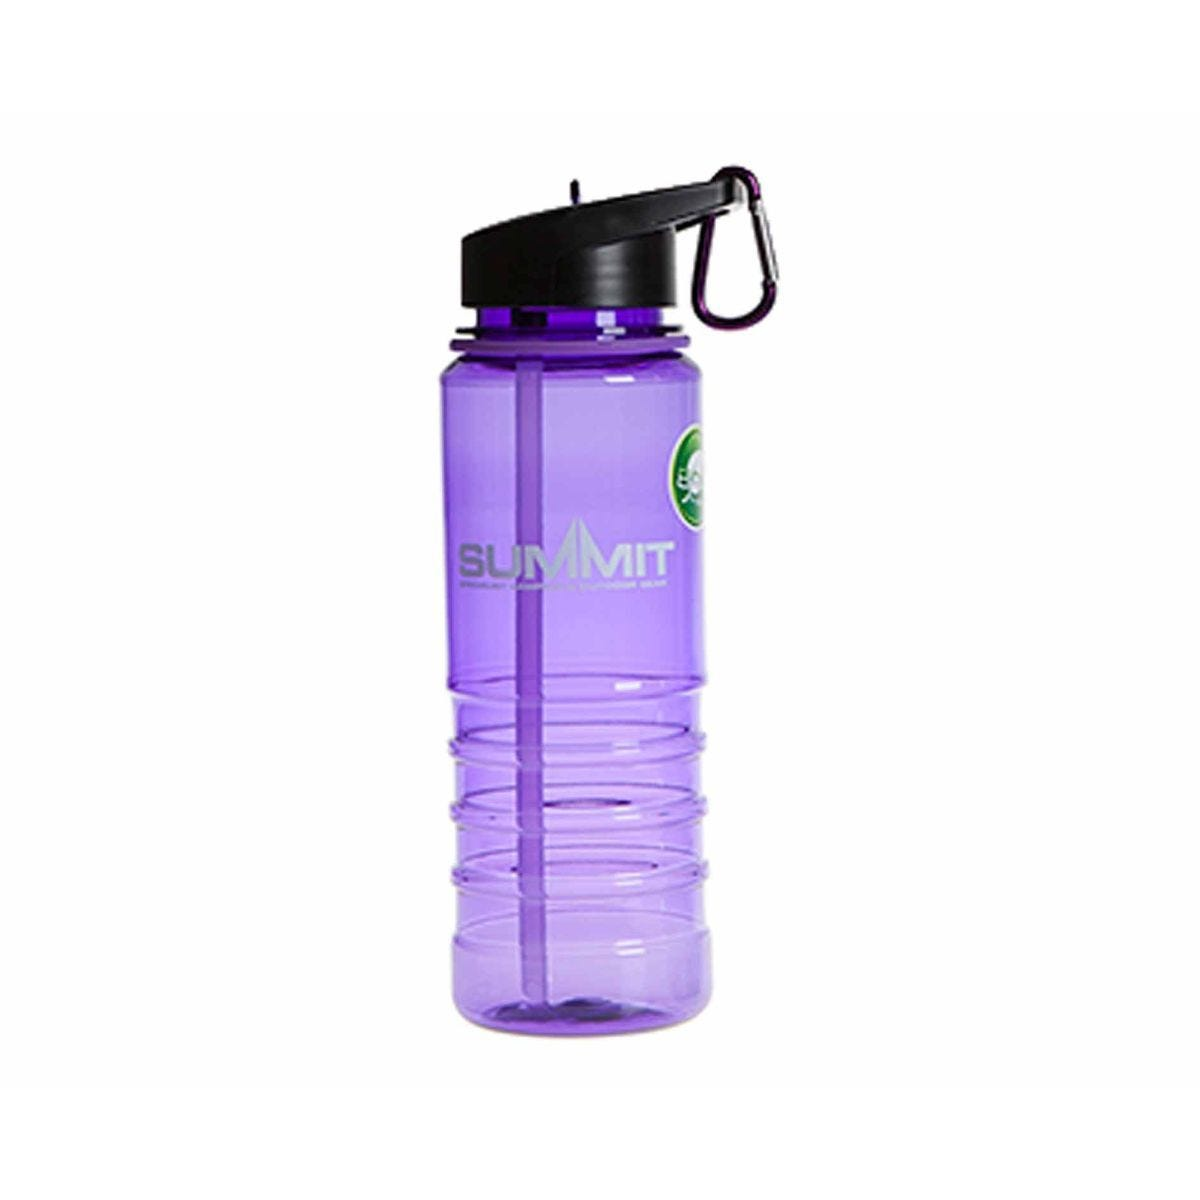 Summit Water Bottle with Carabiner 700ml Purple